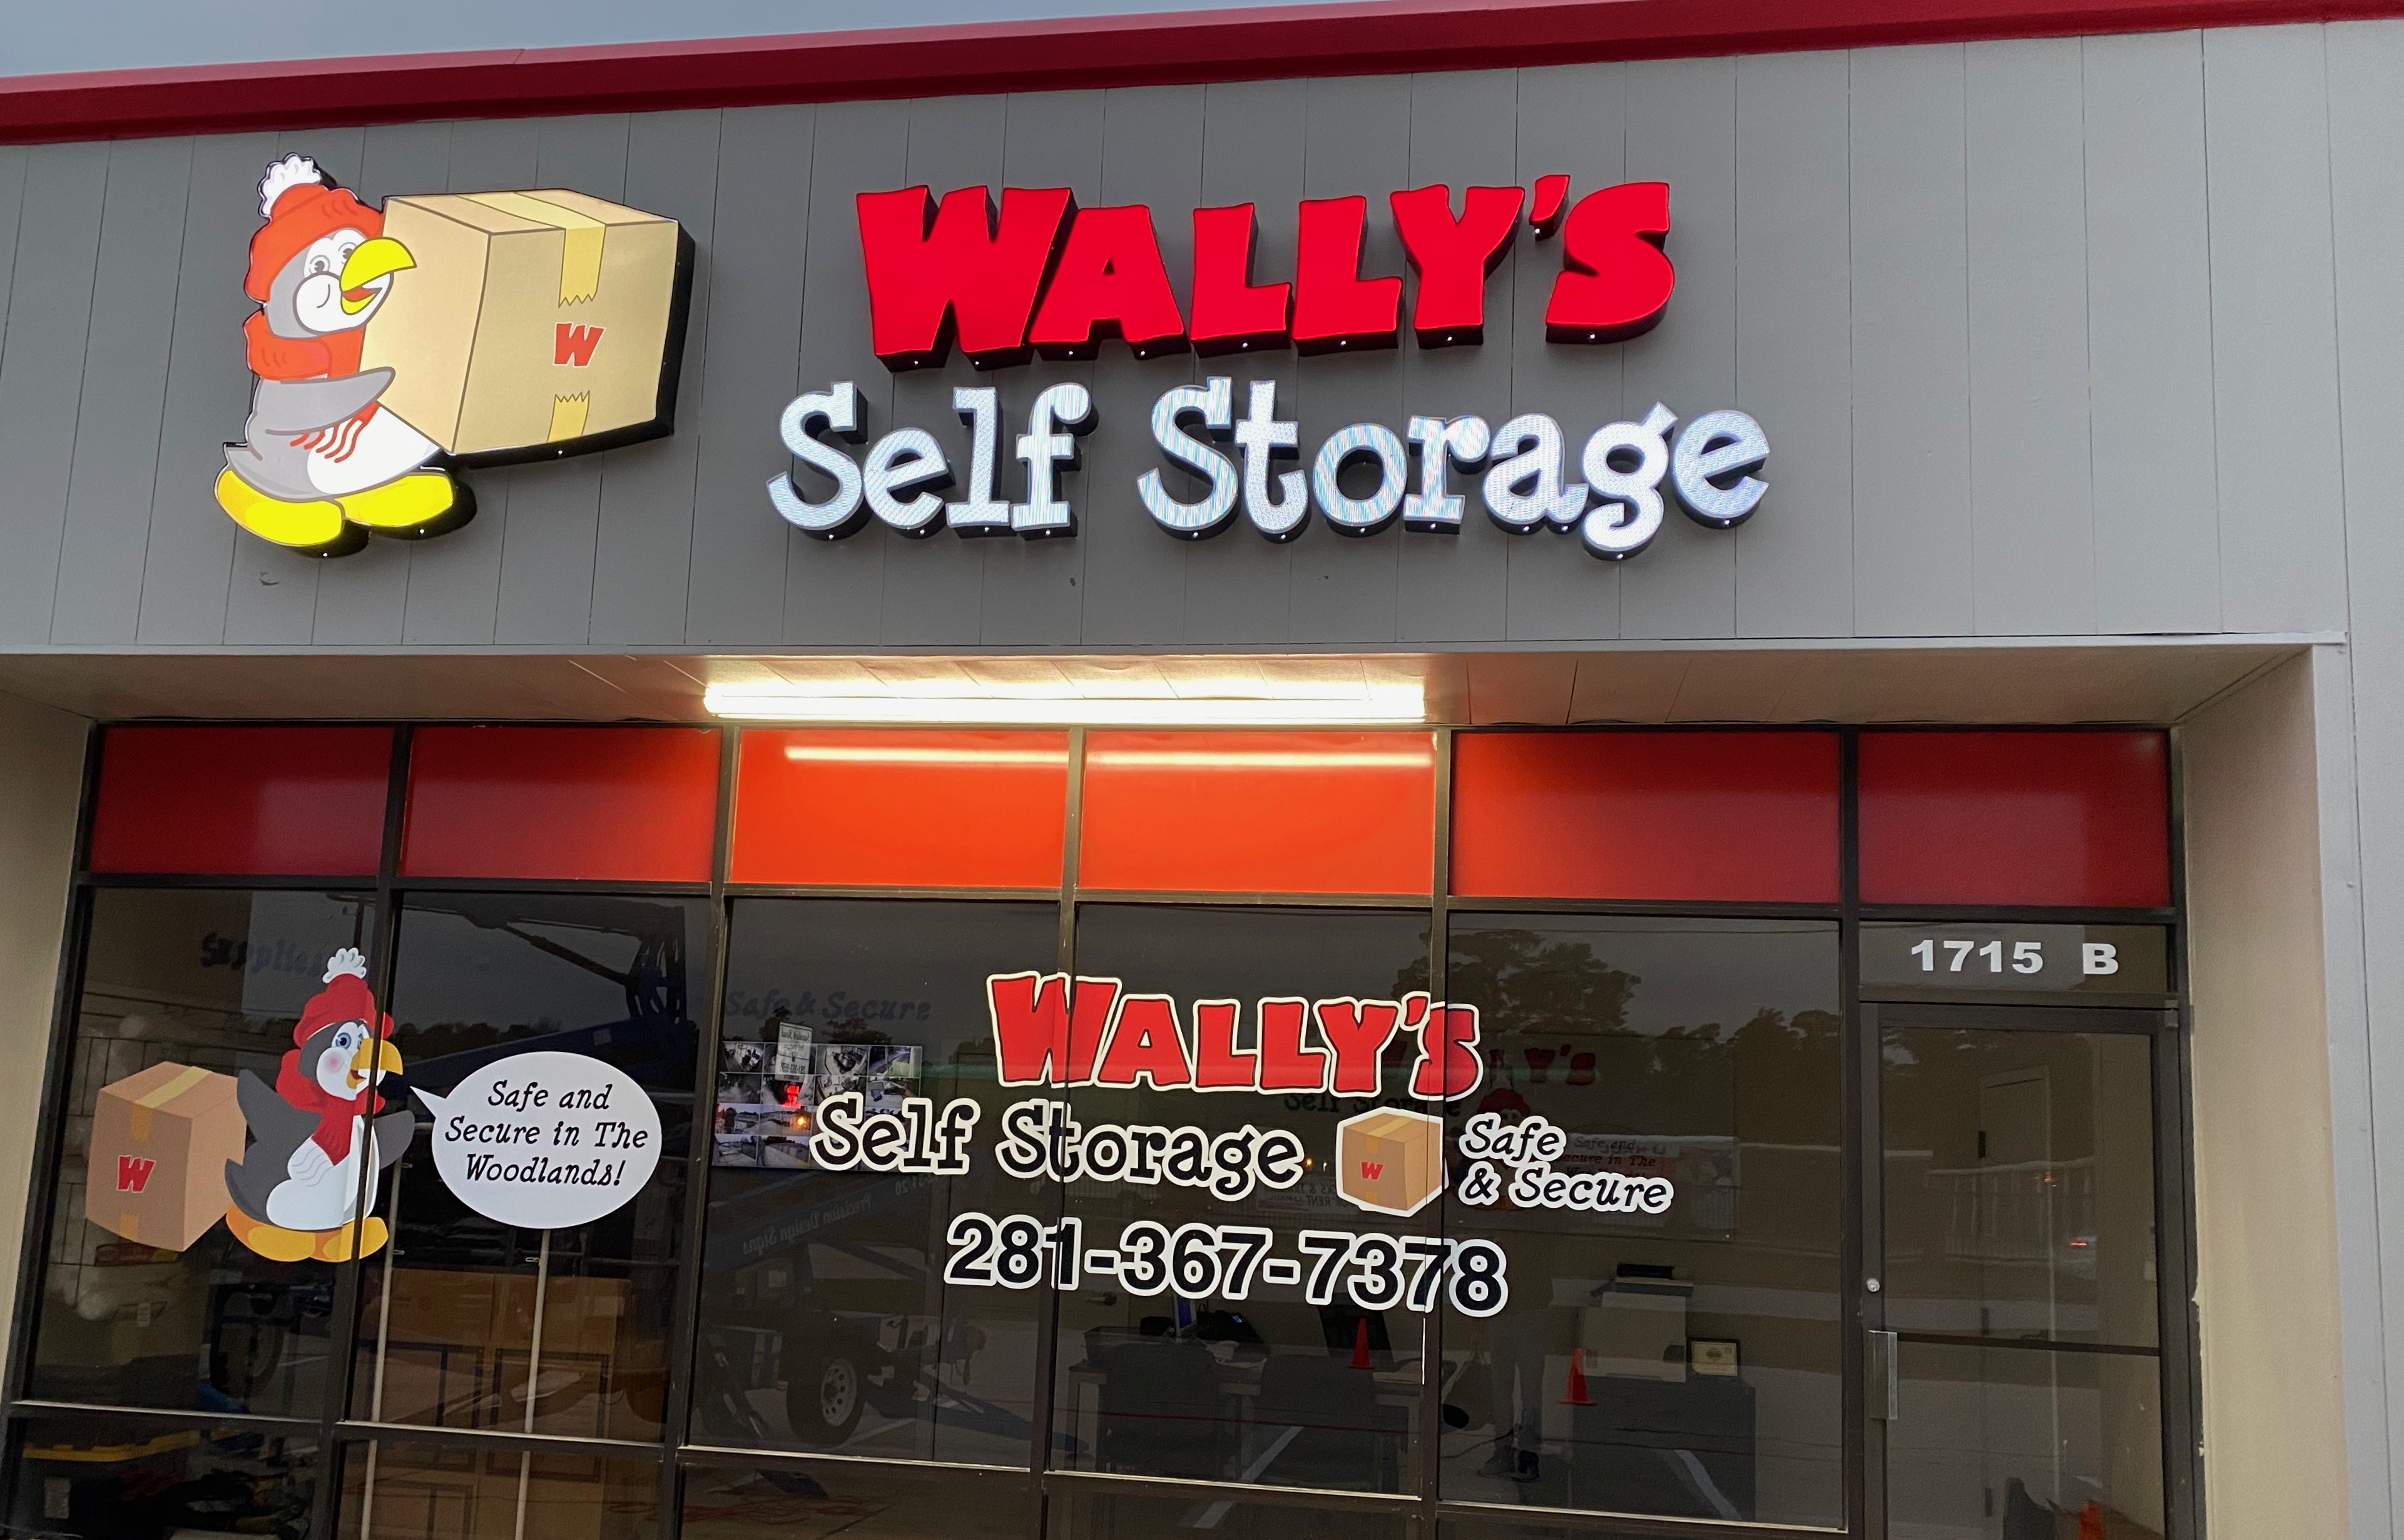 Wally's Self Storage Storefront Lit